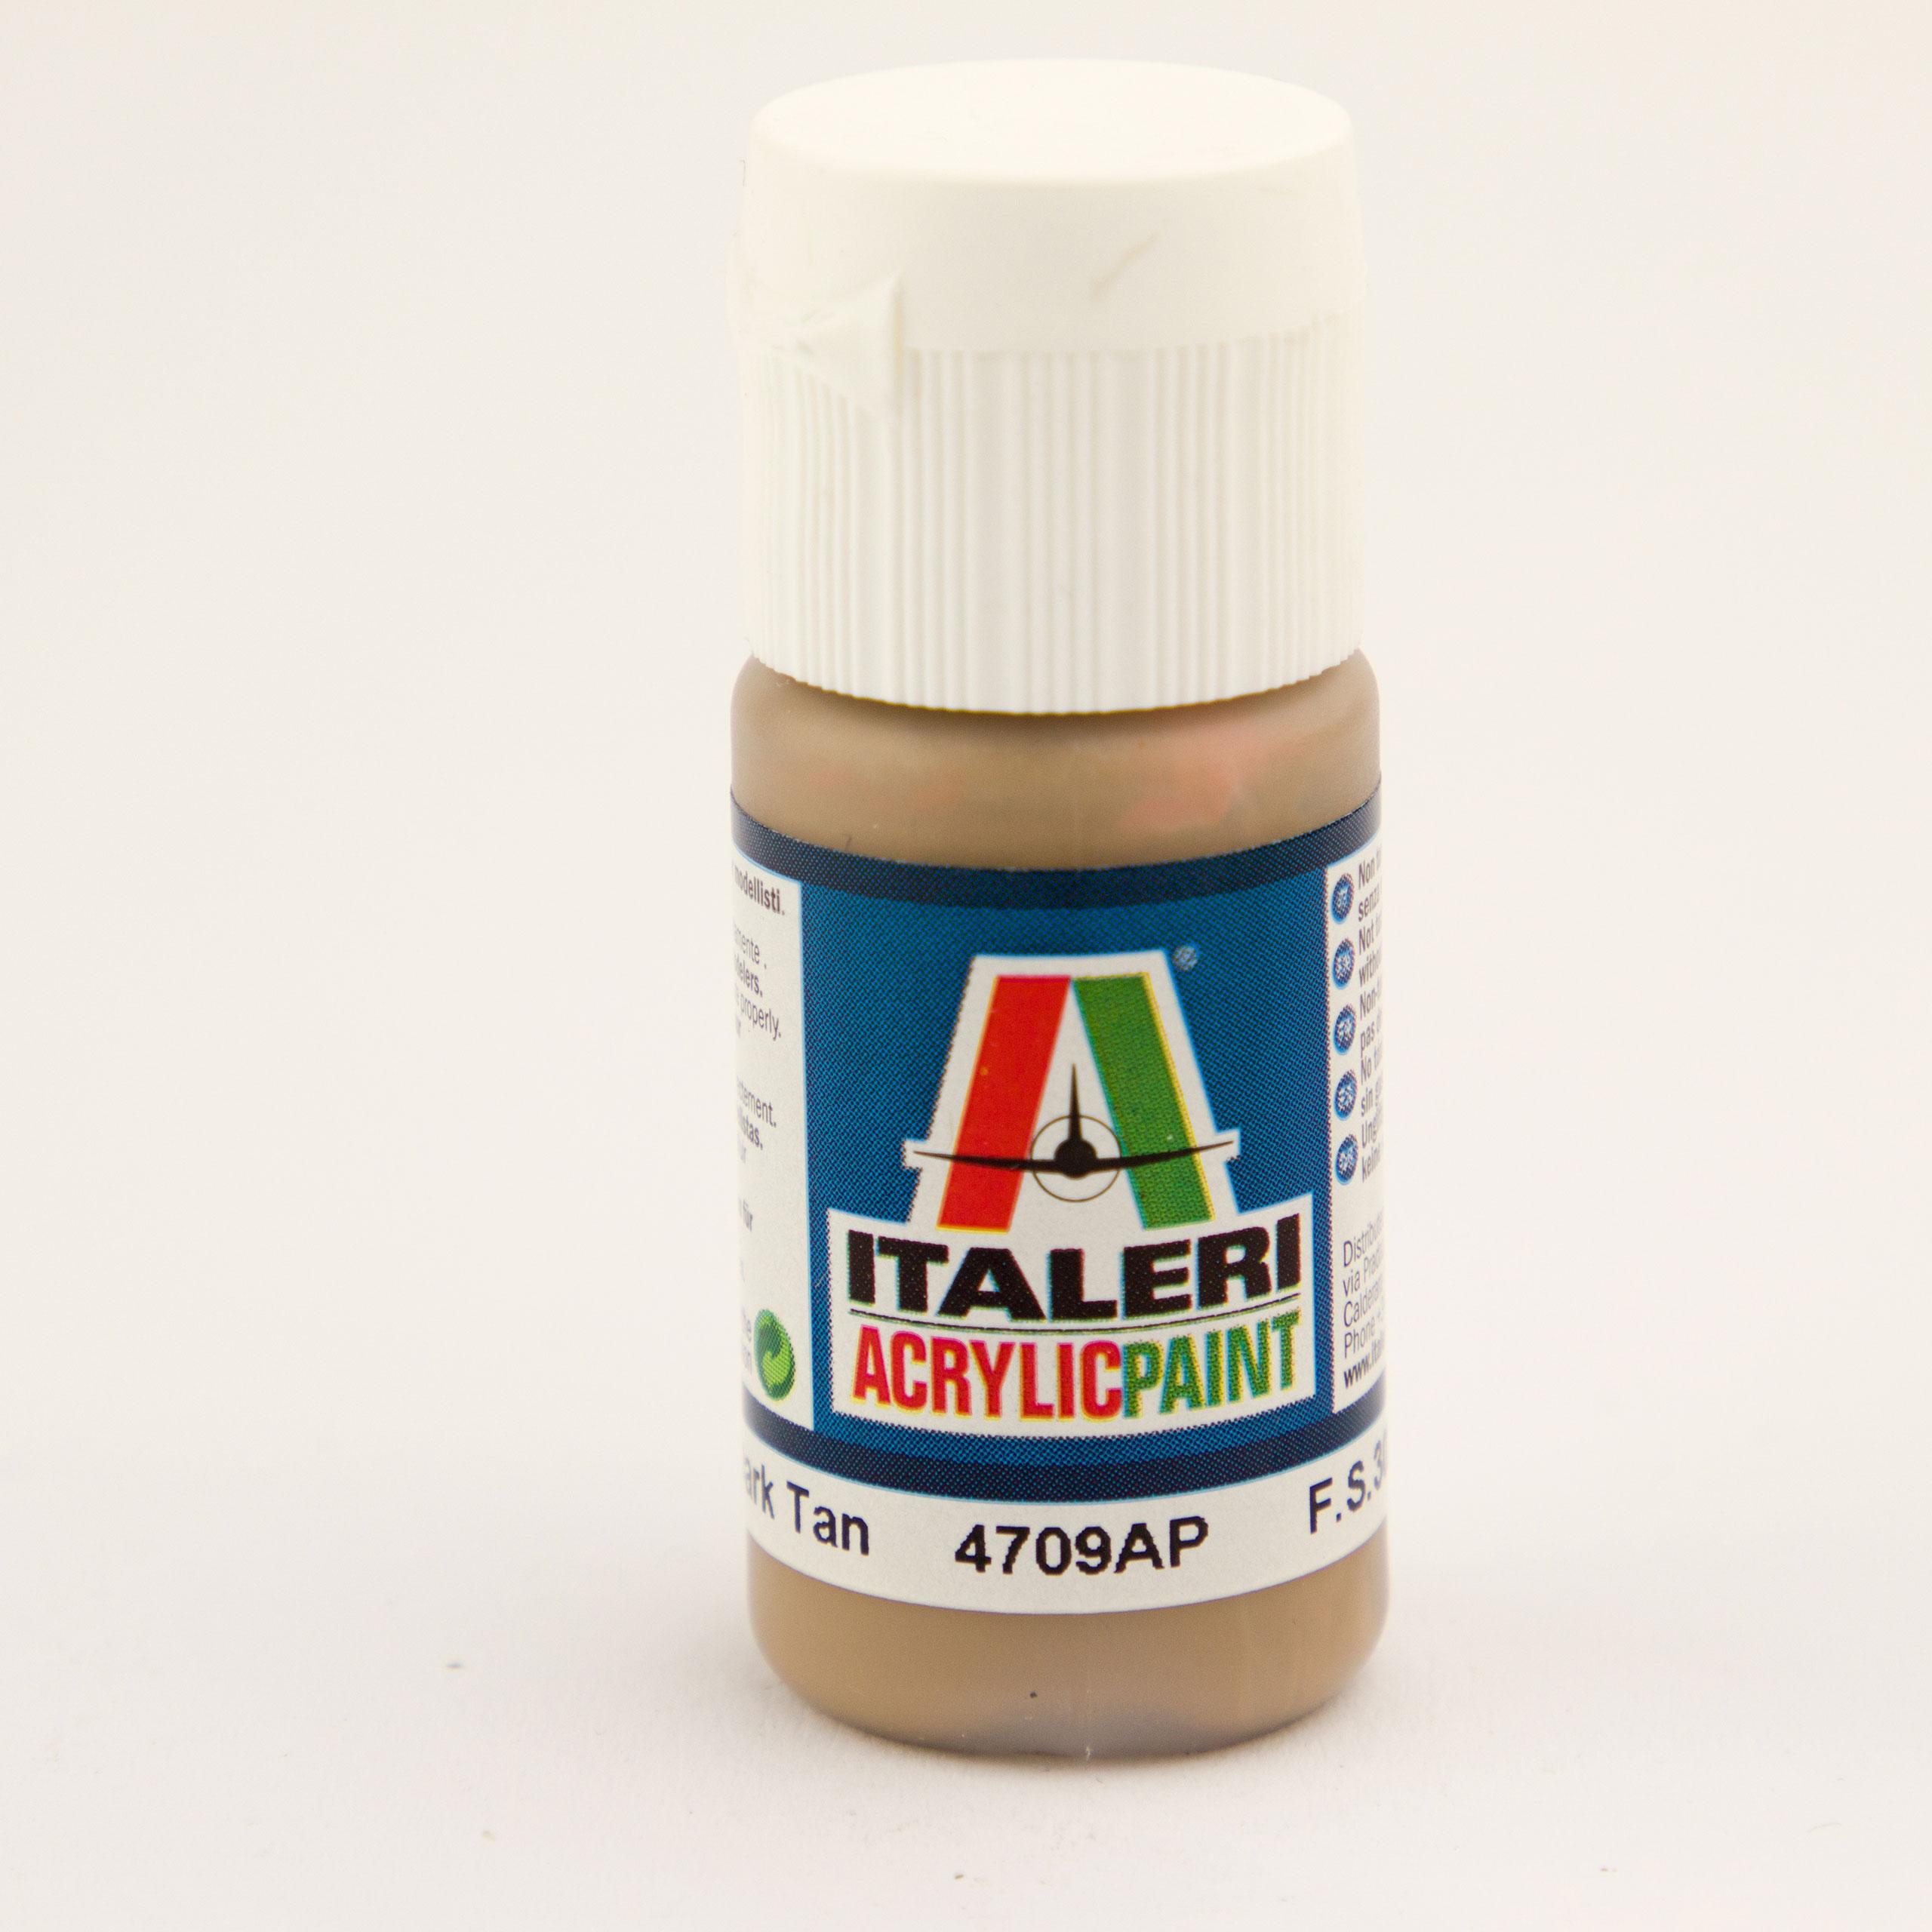 Italeri IT Acrylfarbe 4709 Dkl.Braun/Tan 20 ml Airbrush Farbe